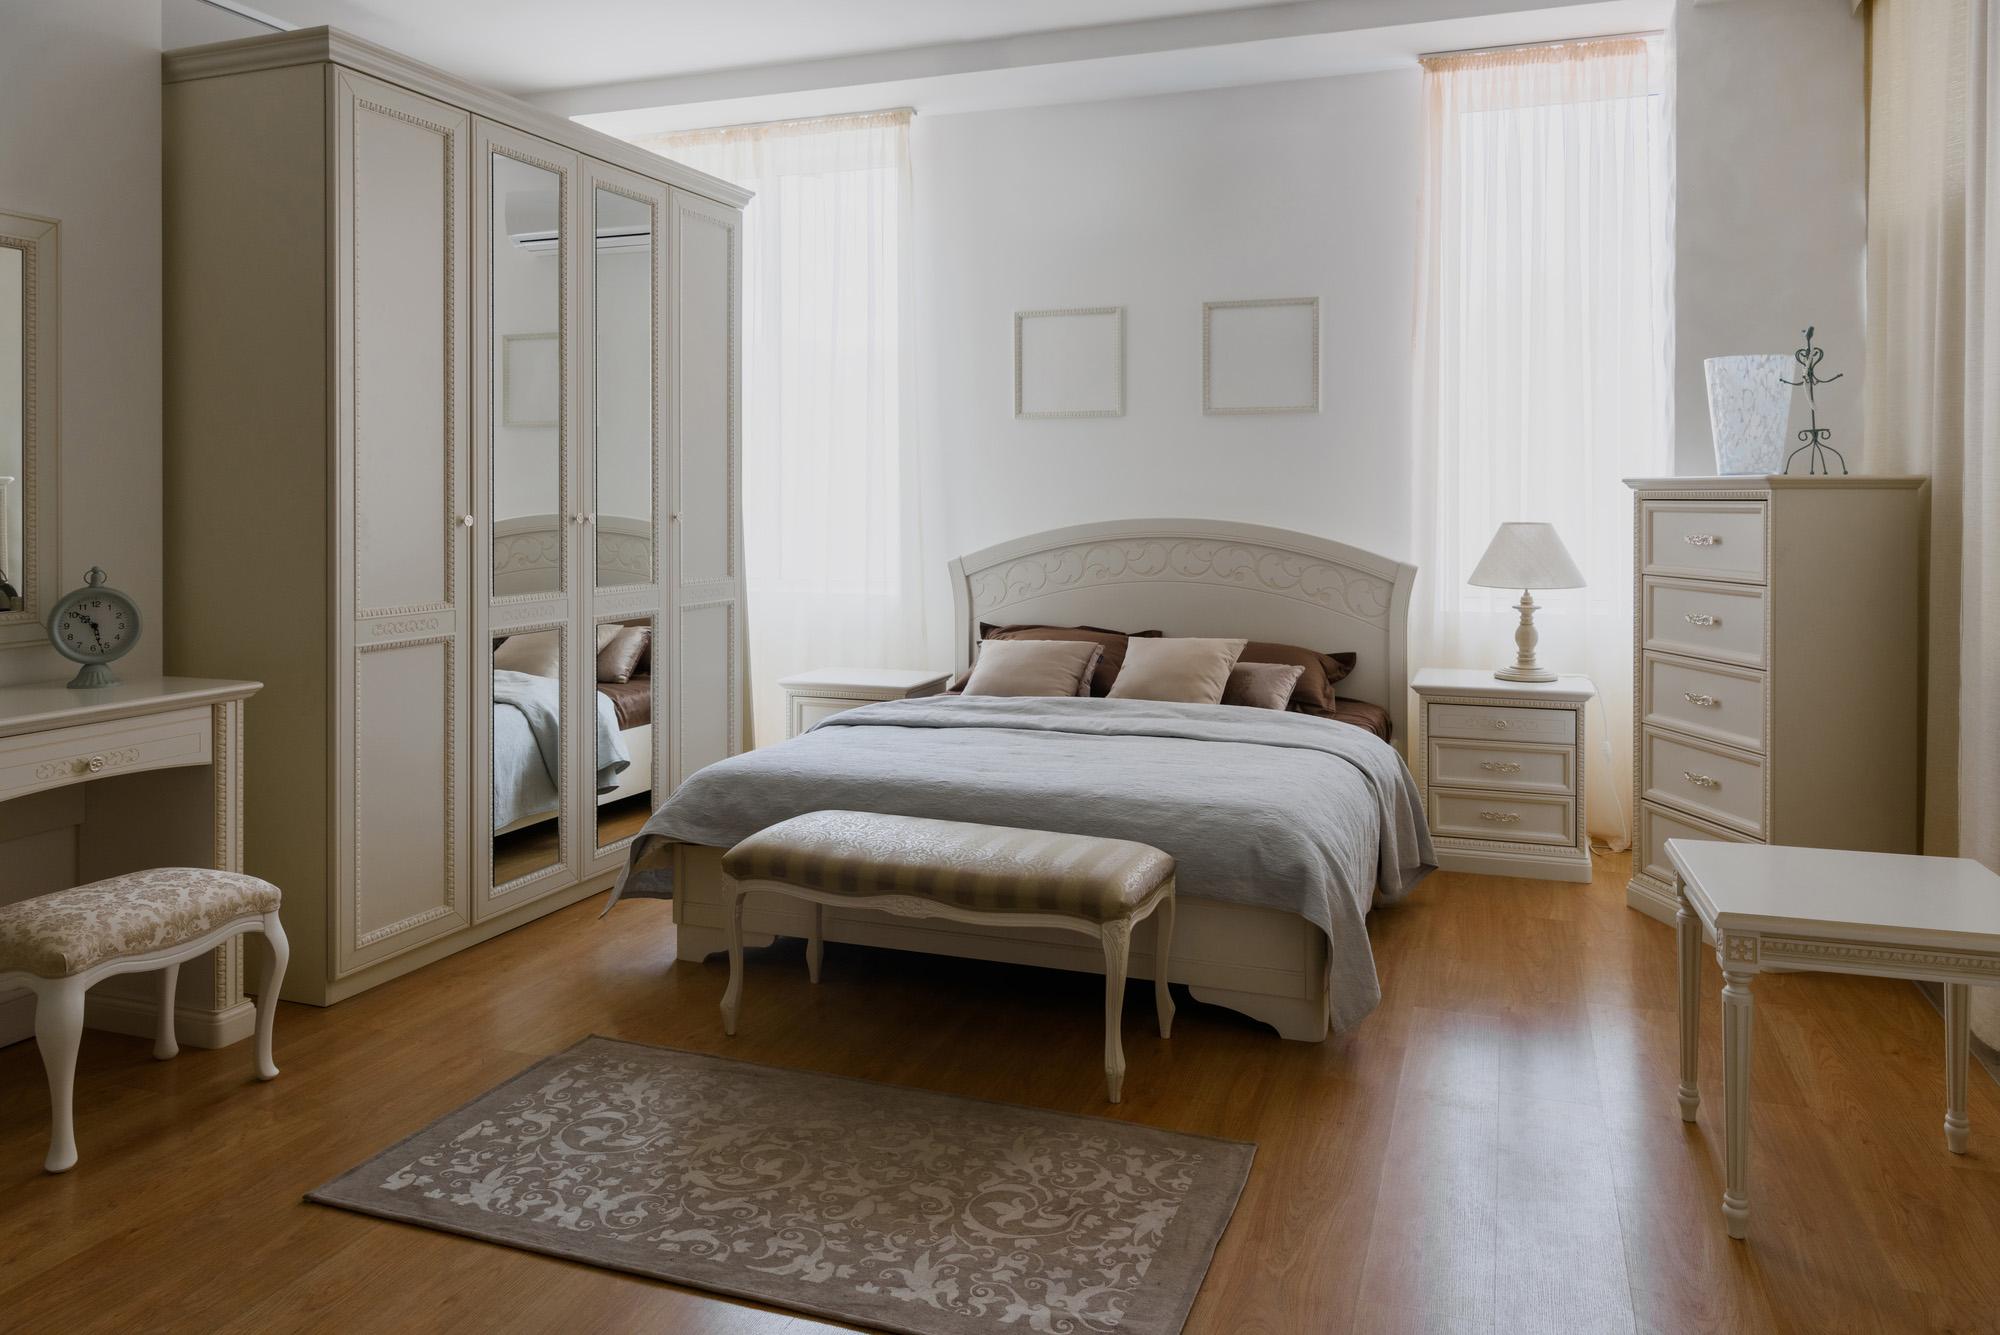 Bedroom ideas storage, bedroom furniture, wardrobe sets